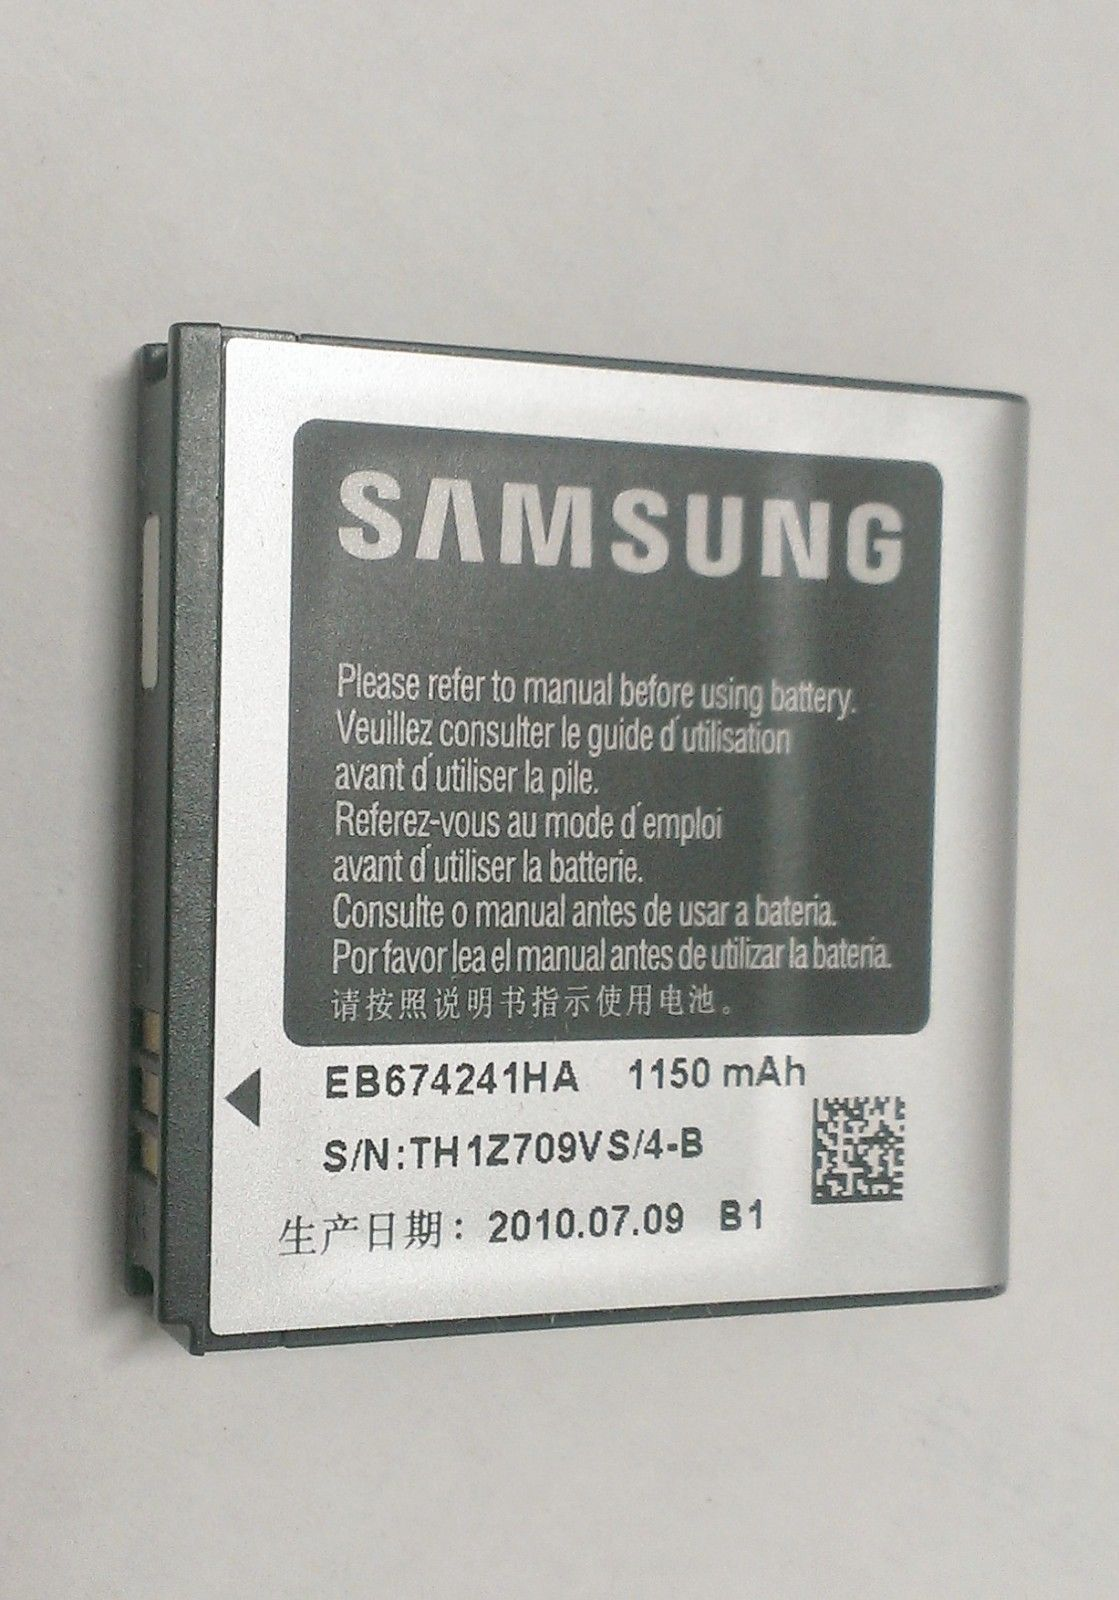 OEM Samsung Battery A897 Mythic AT&T EB674241HA